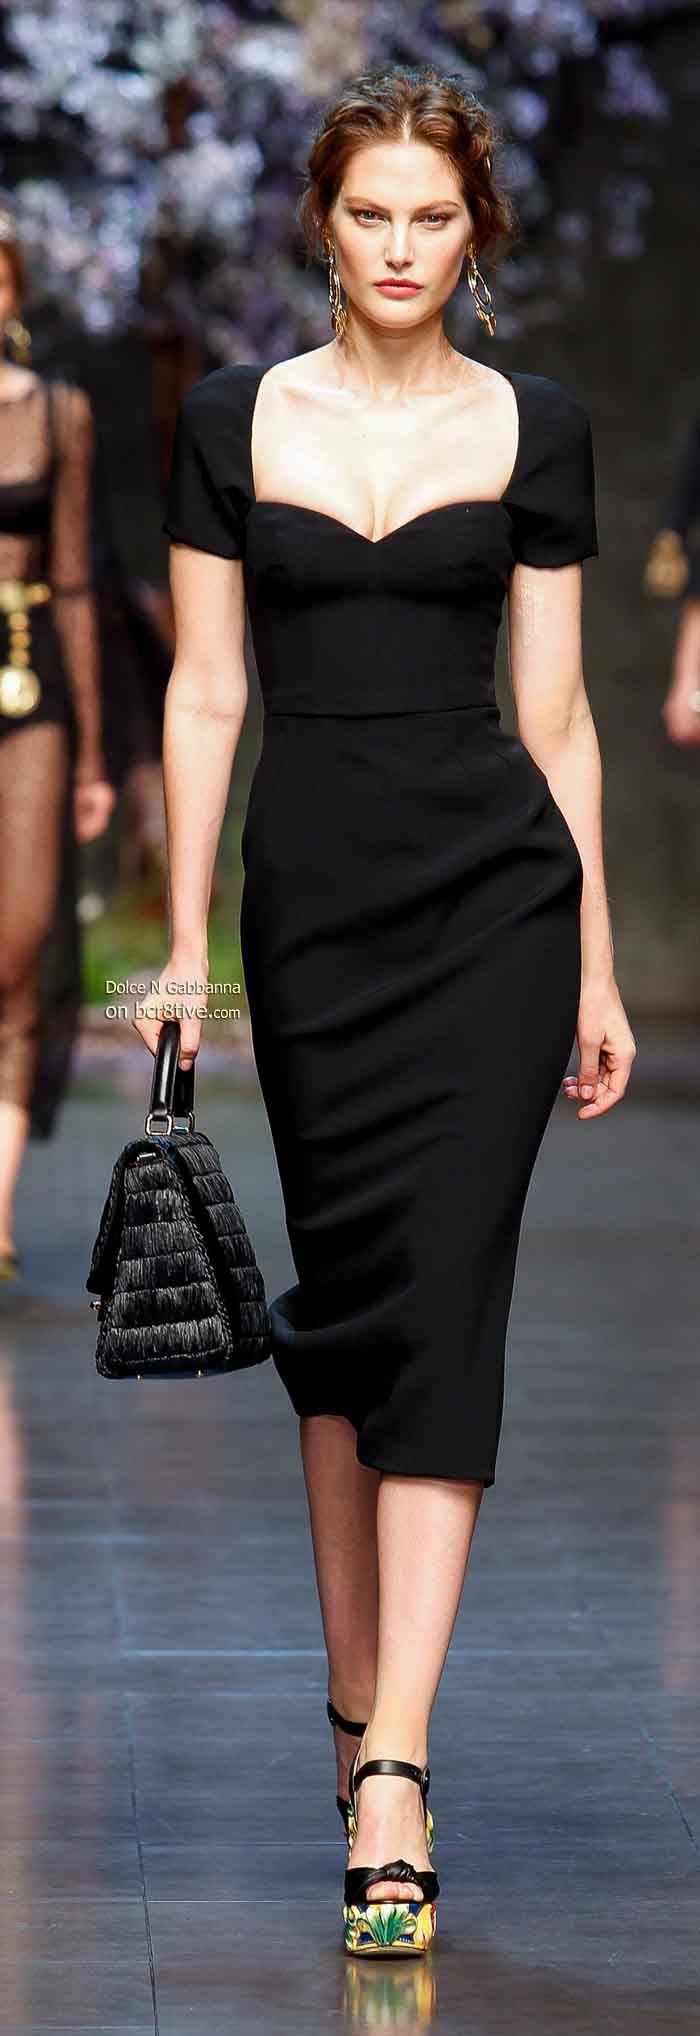 Dolce & Gabbana Spring 2014- so simple, so classic